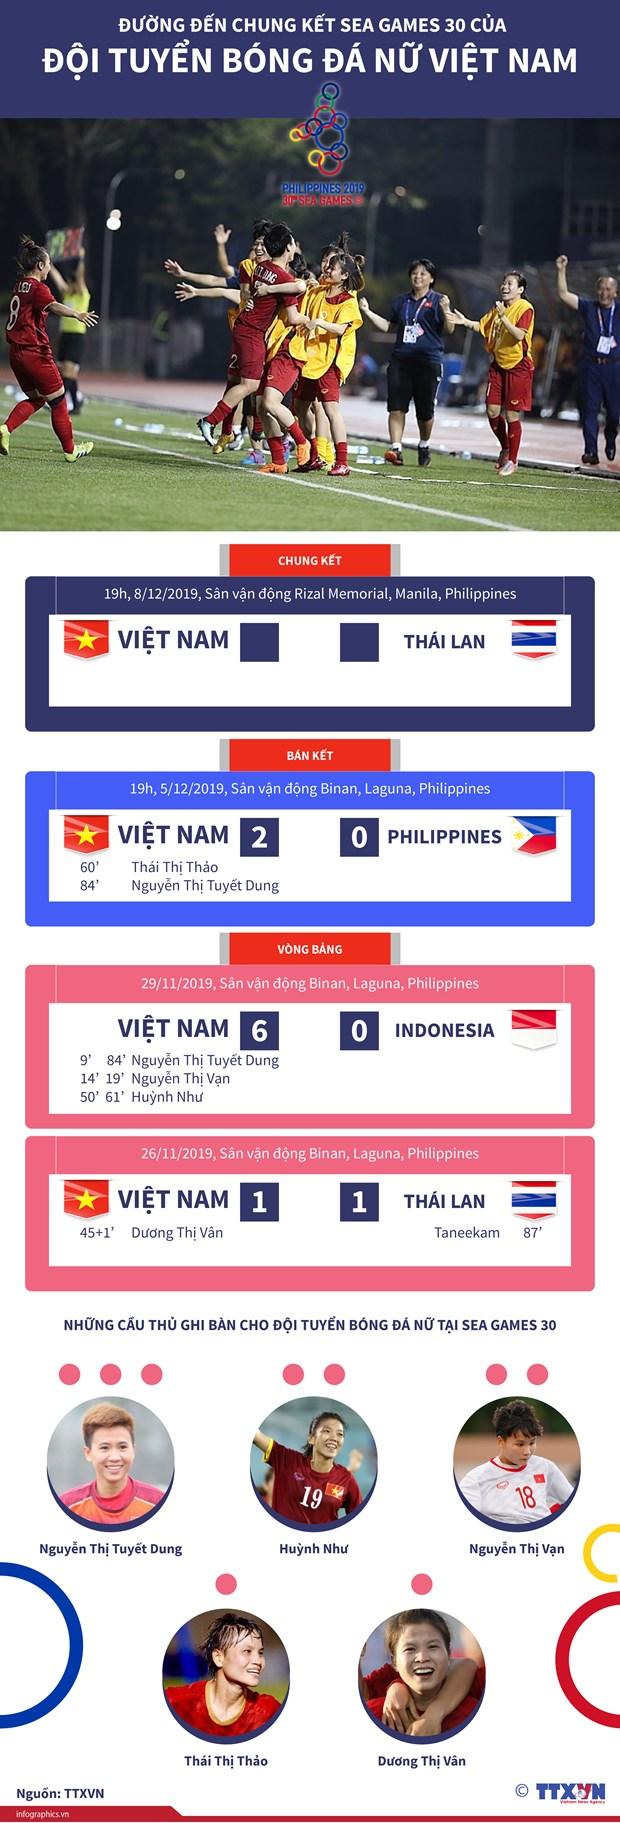 SEA Games 30: Tuyen bong da nu dua doan Viet Nam tro lai top 2 hinh anh 11